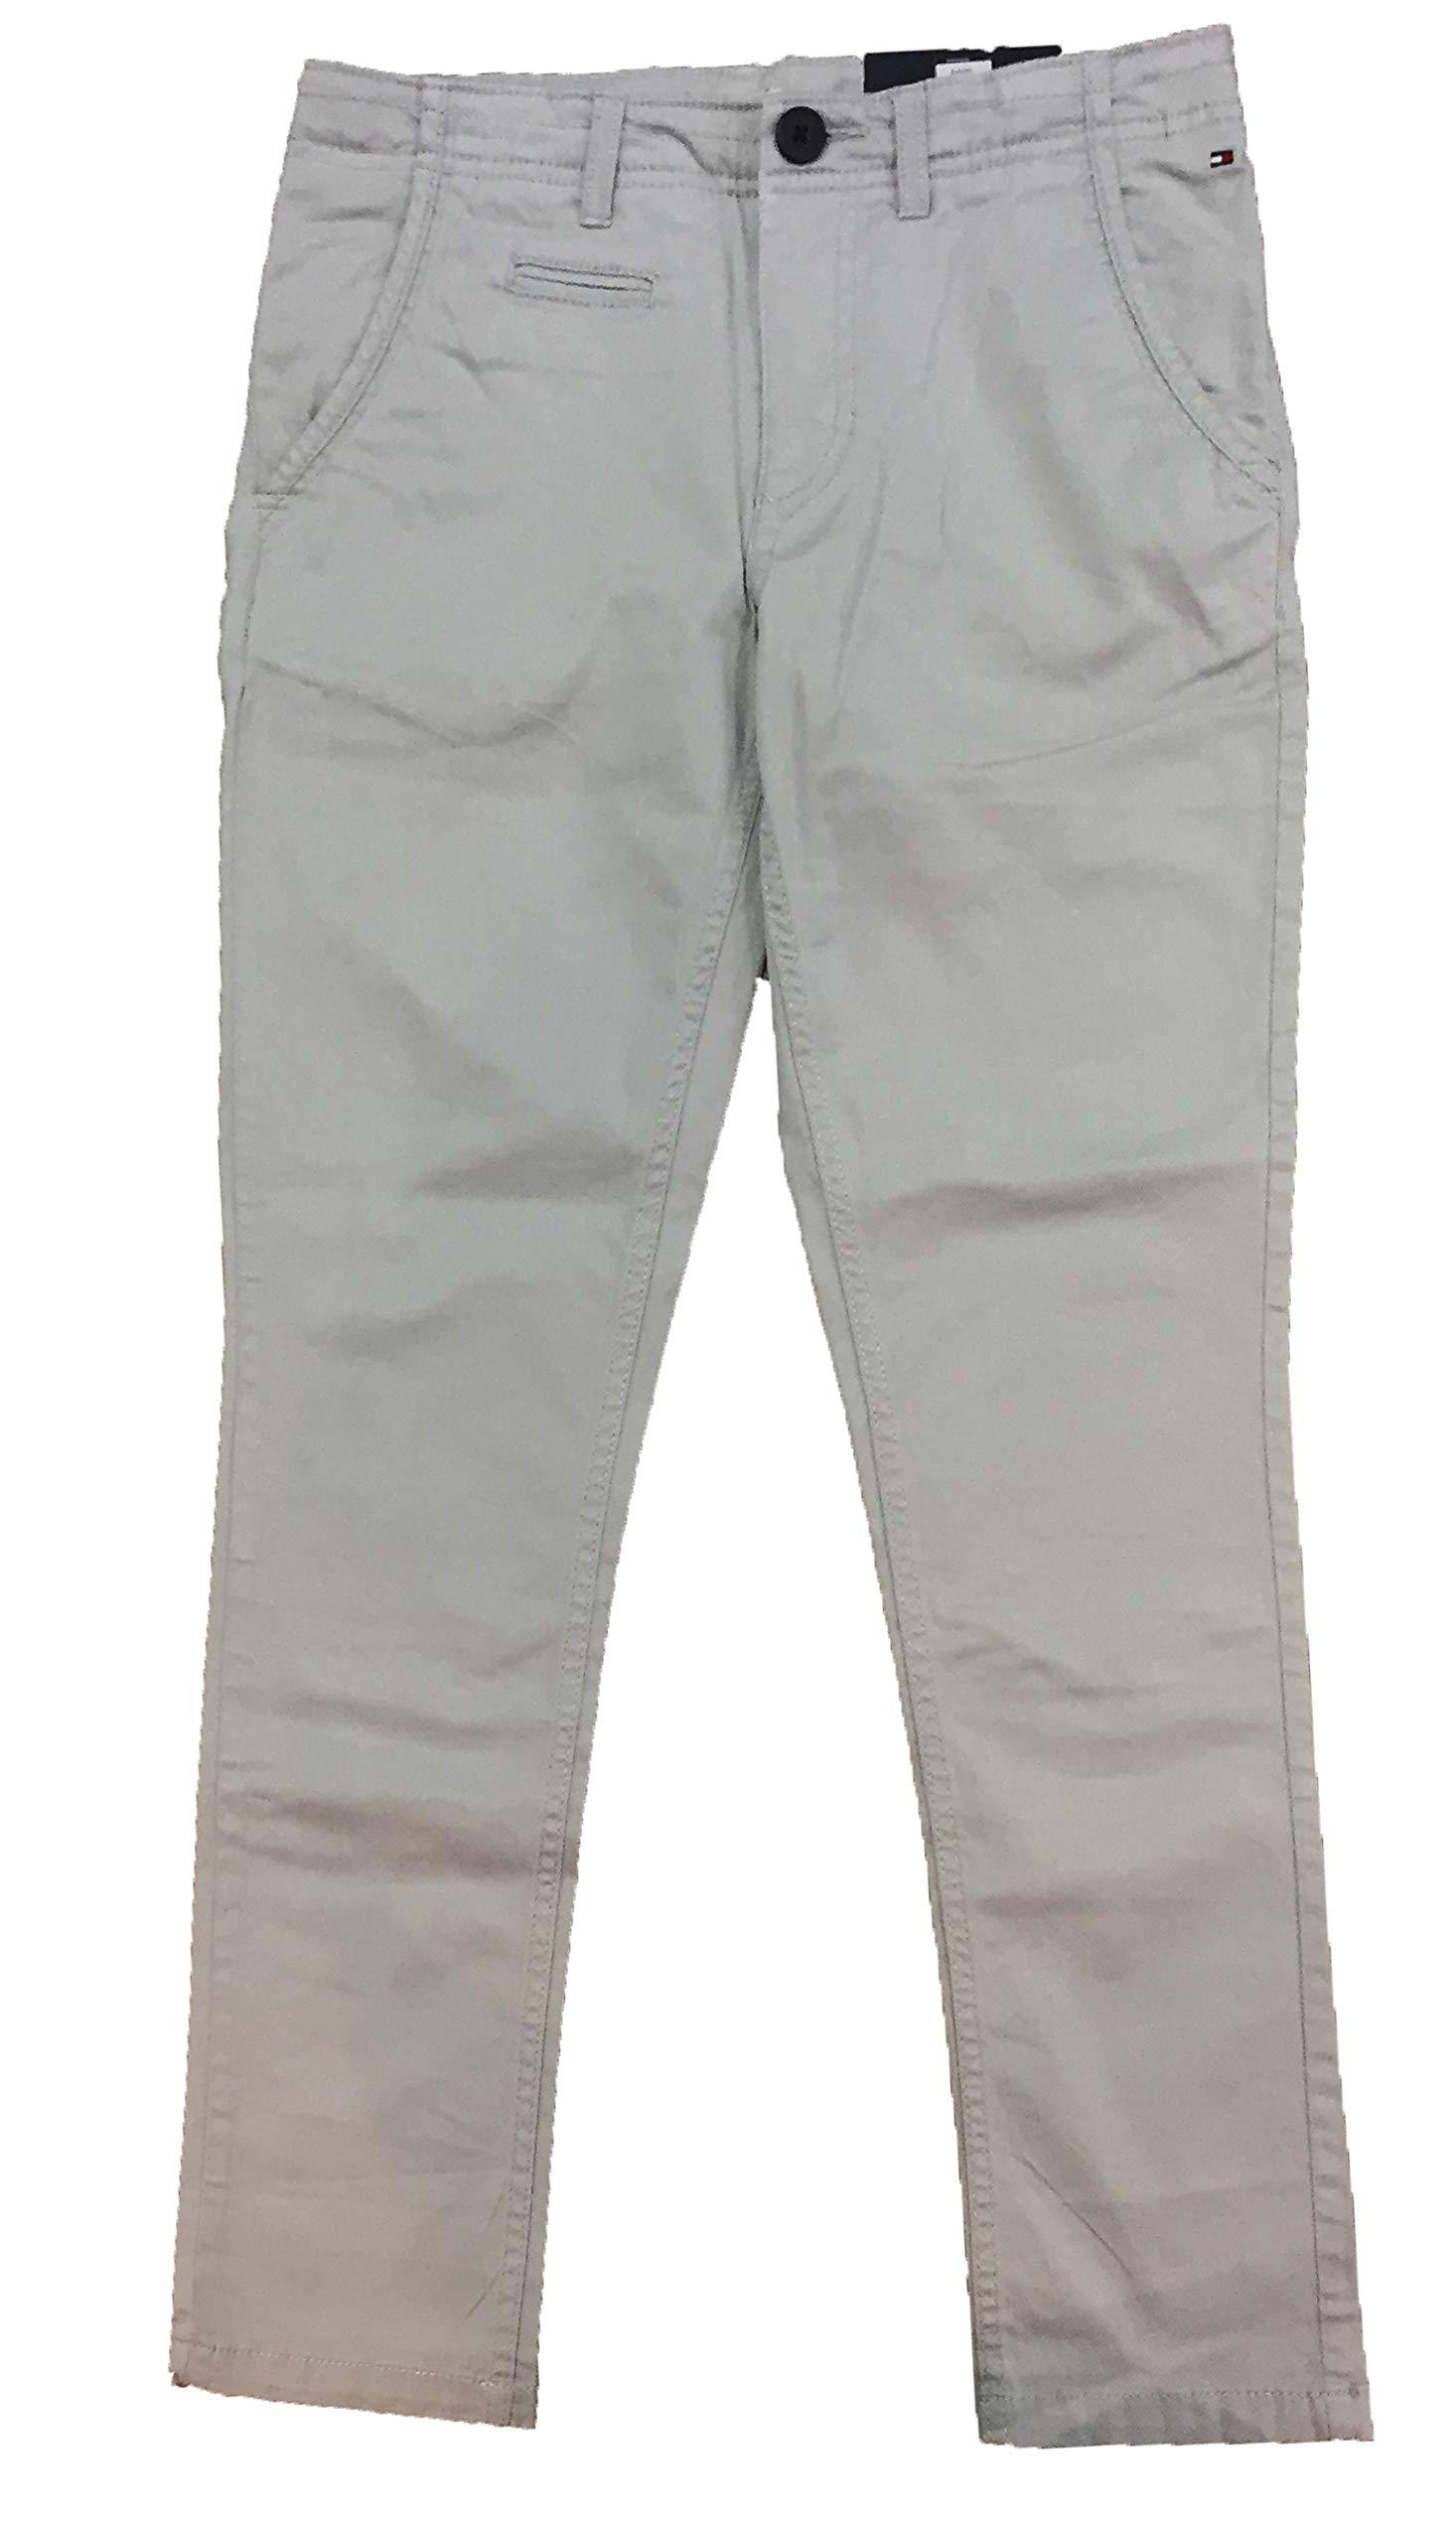 Tommy Hilfiger – Pantalon Largo Chino, niño, Color: Gris Ceniza, Talla:12